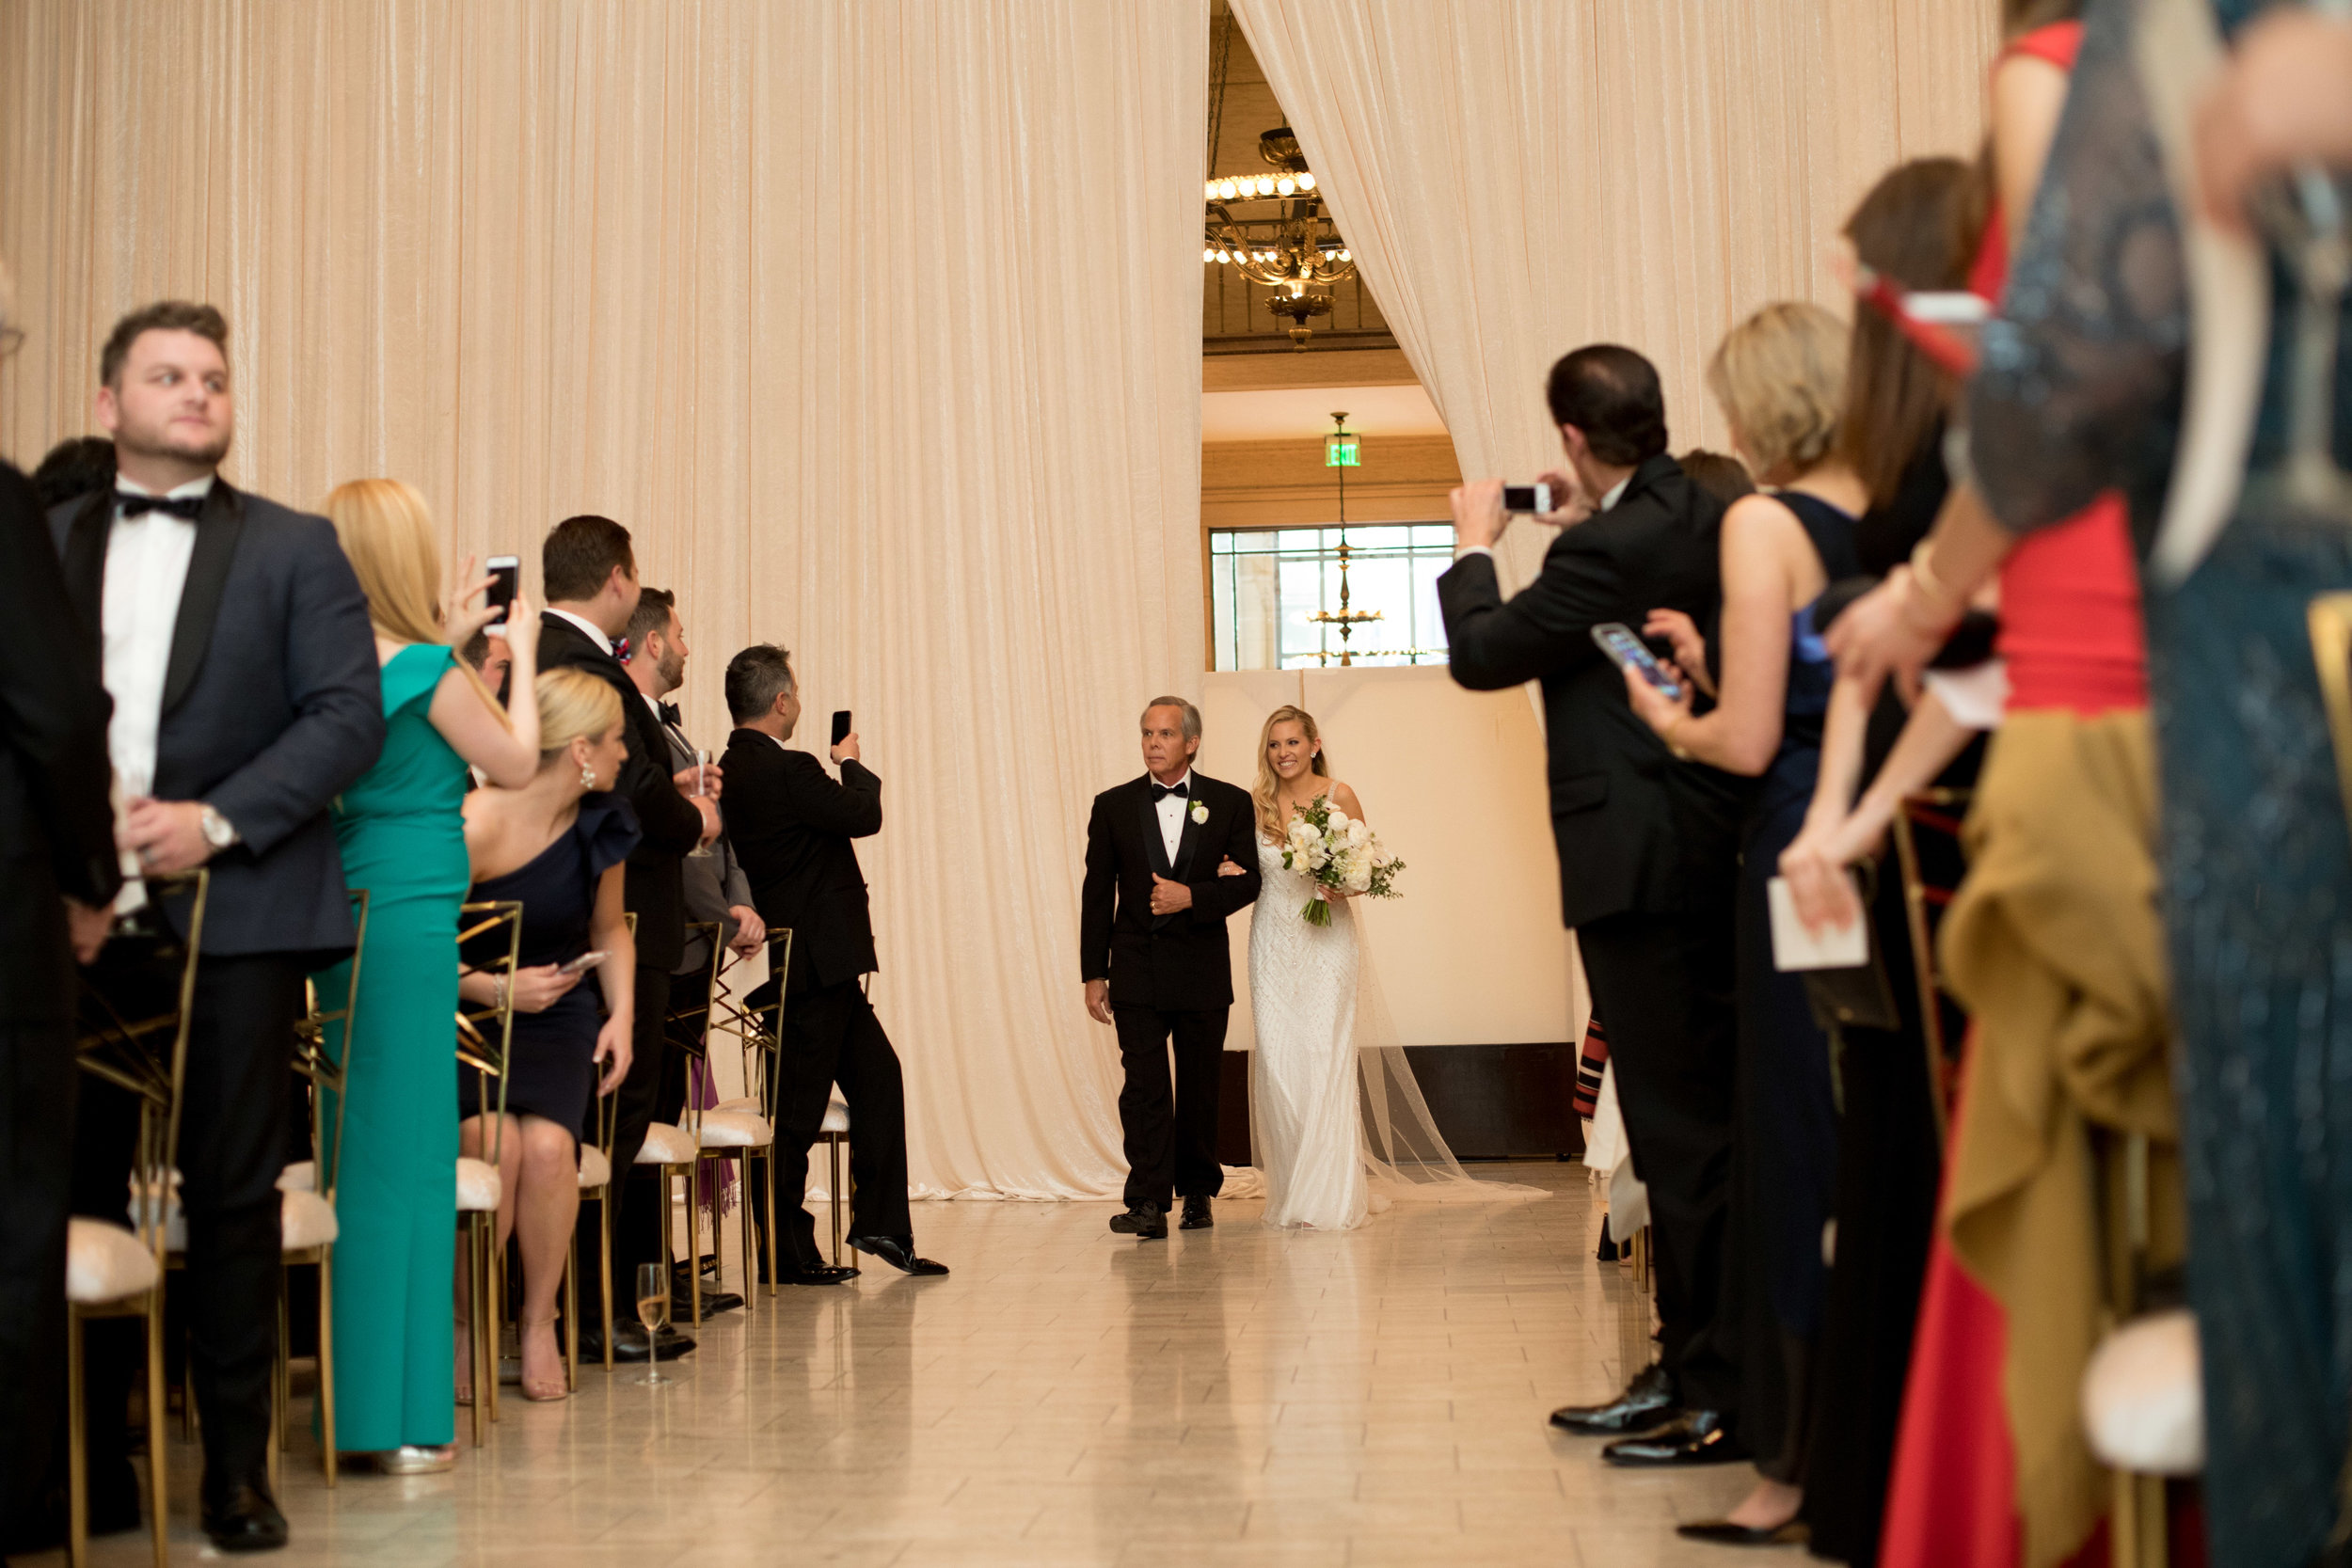 Kristin Sweeting Photography www.kristinsweeting.com